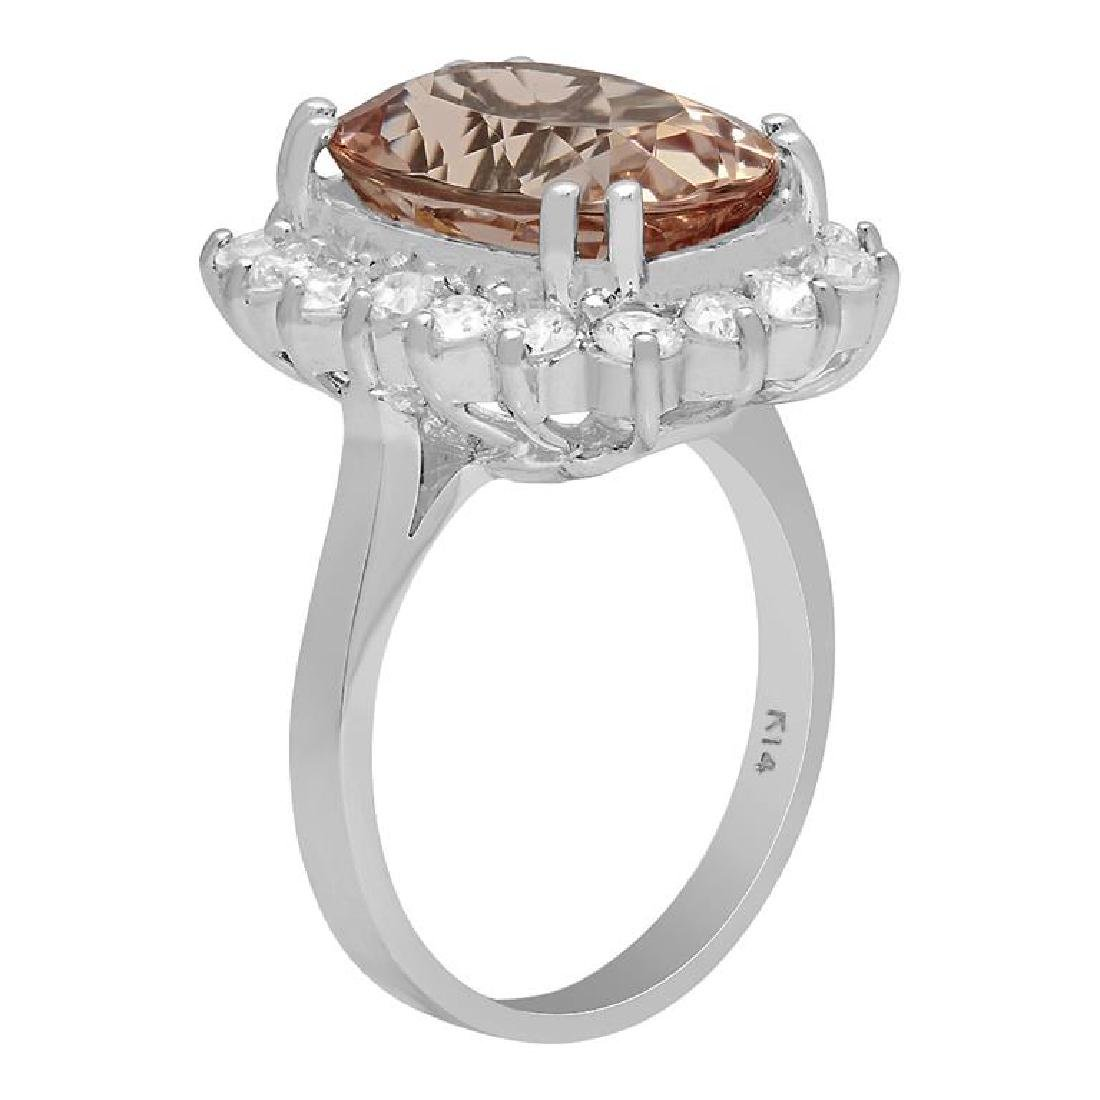 14k White Gold 6.38ct Morganite 1.19ct Diamond Ring - 2